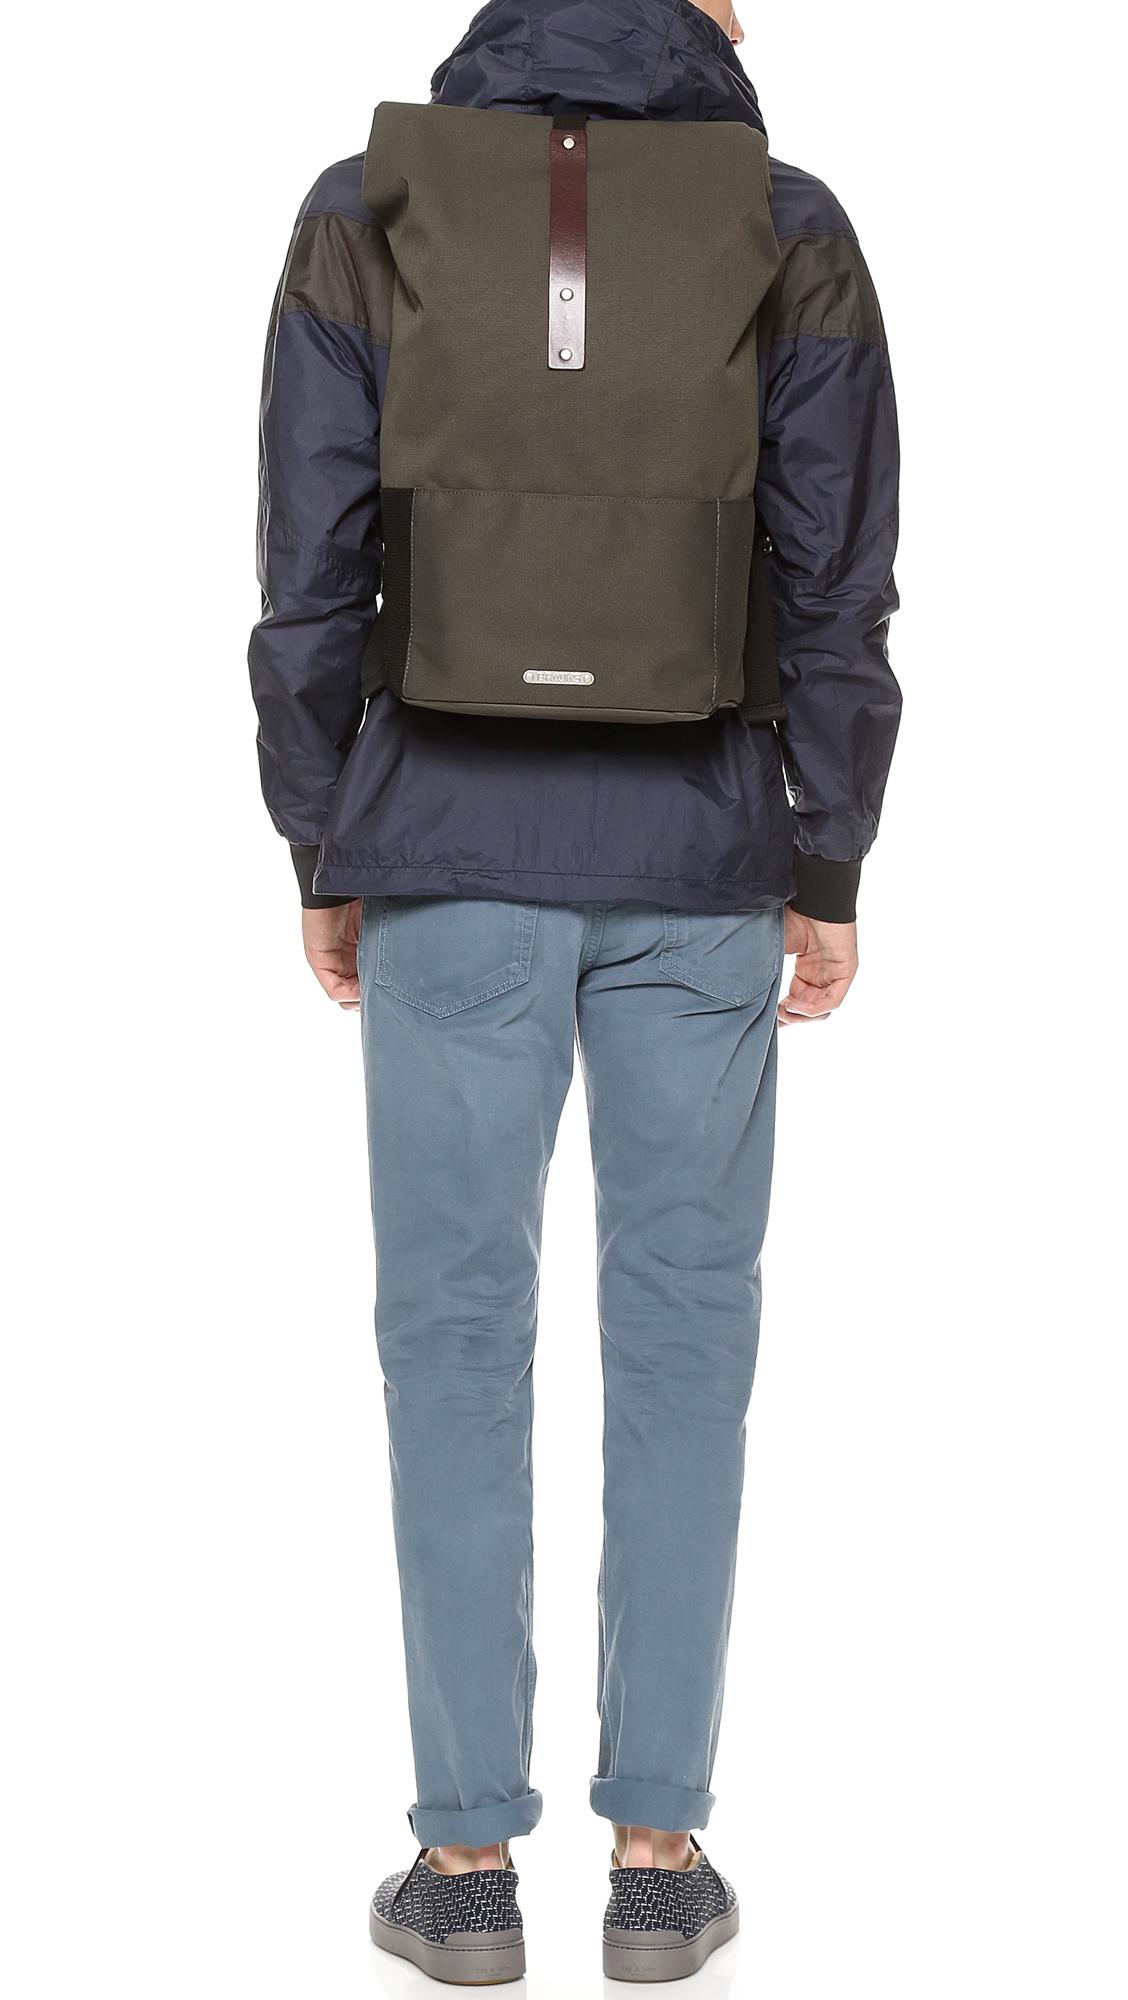 c2f26c00c Brooks England Hackney Utility Backpack | EAST DANE